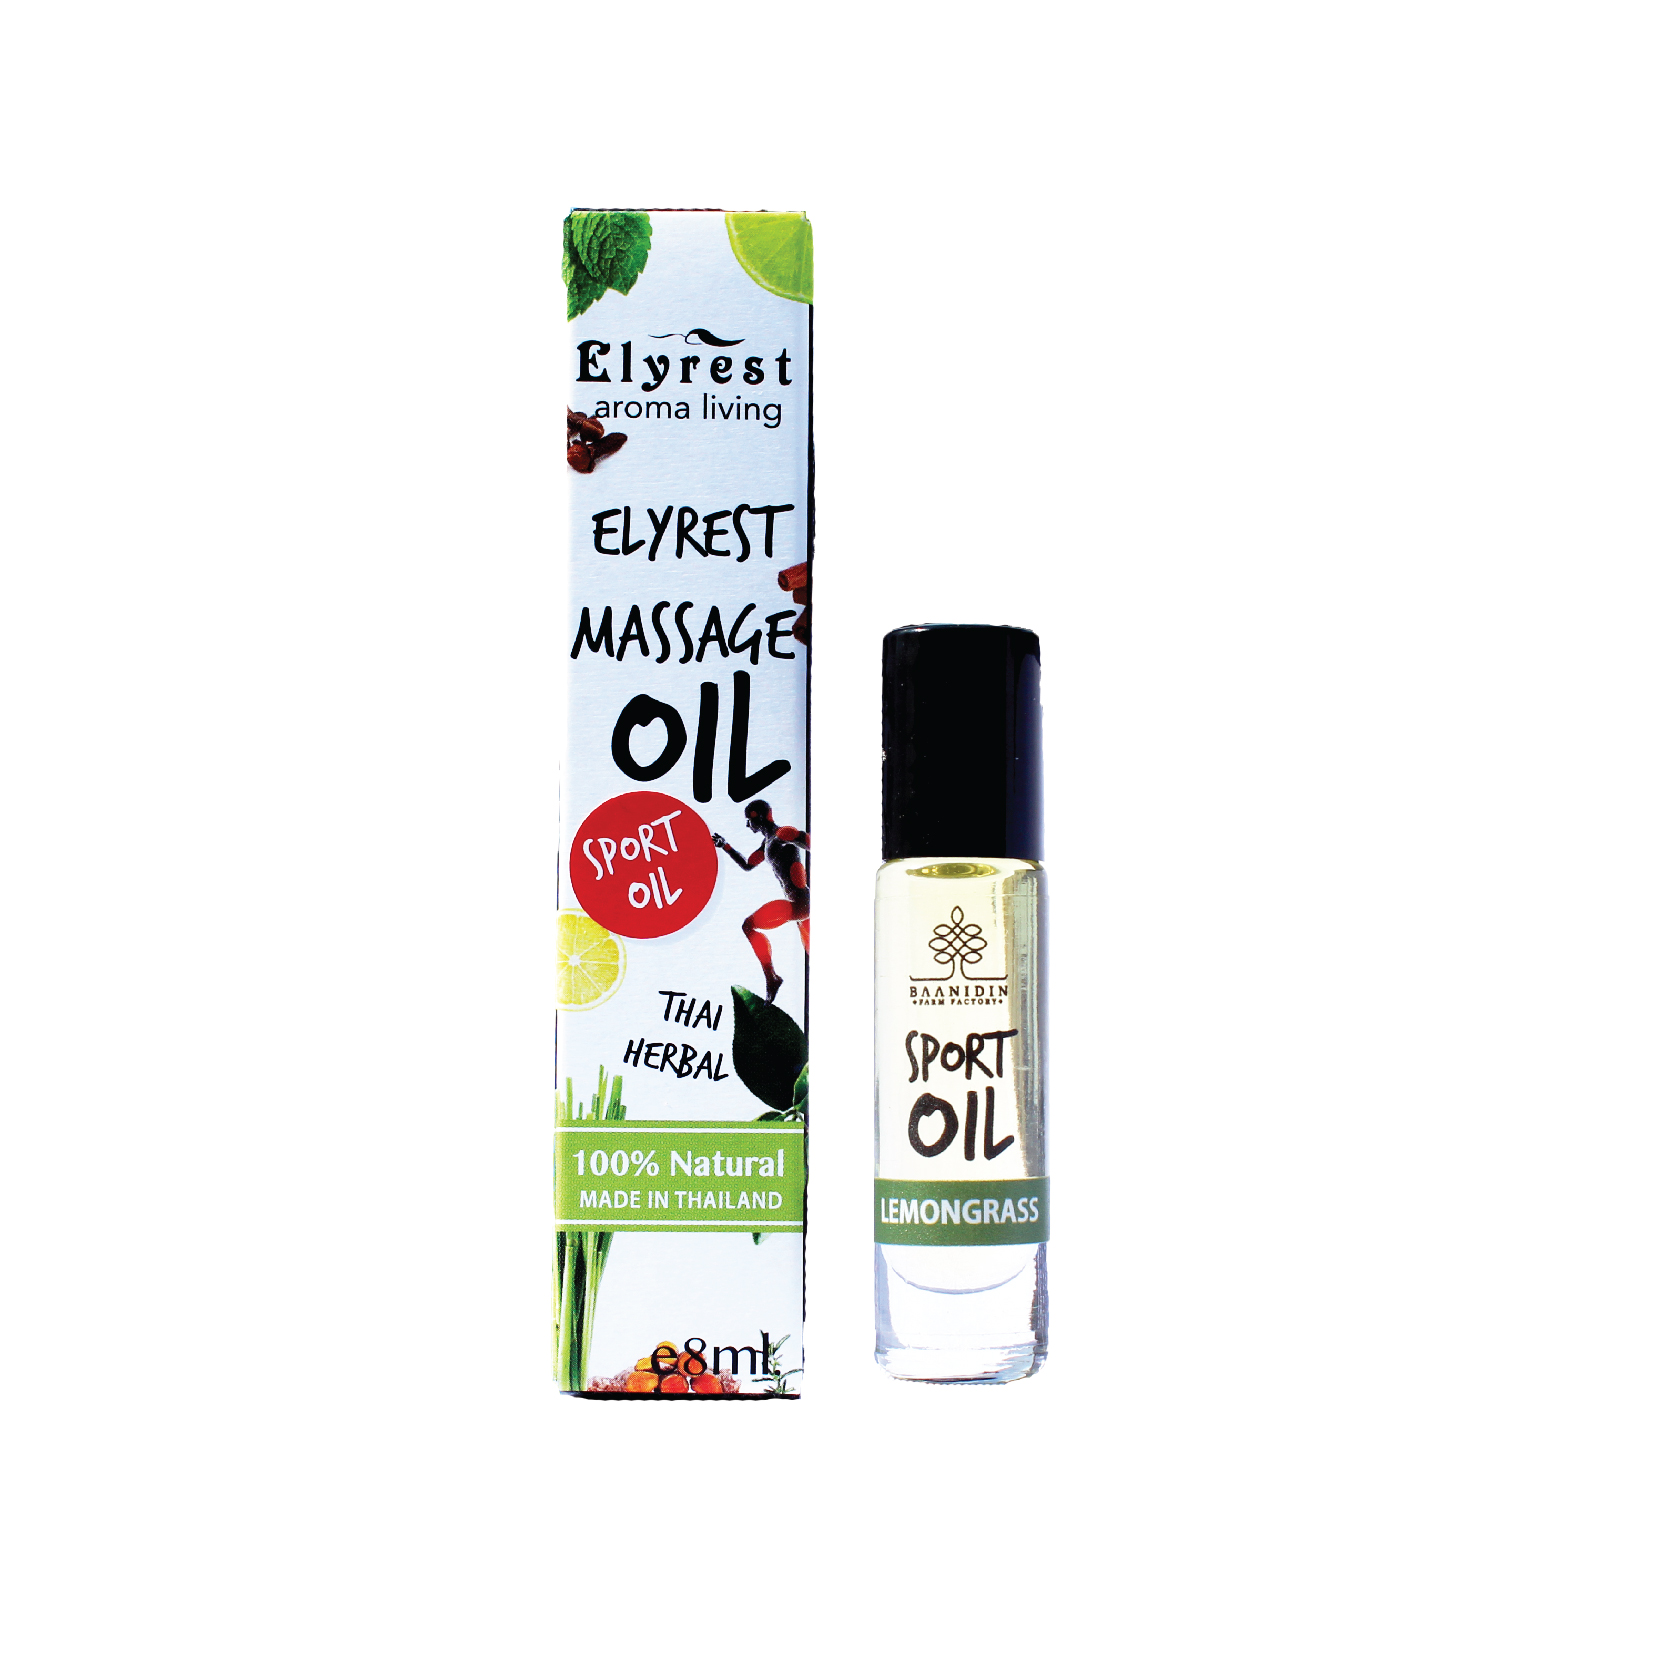 Elyrest by baanidin Herbal oil lemongrass